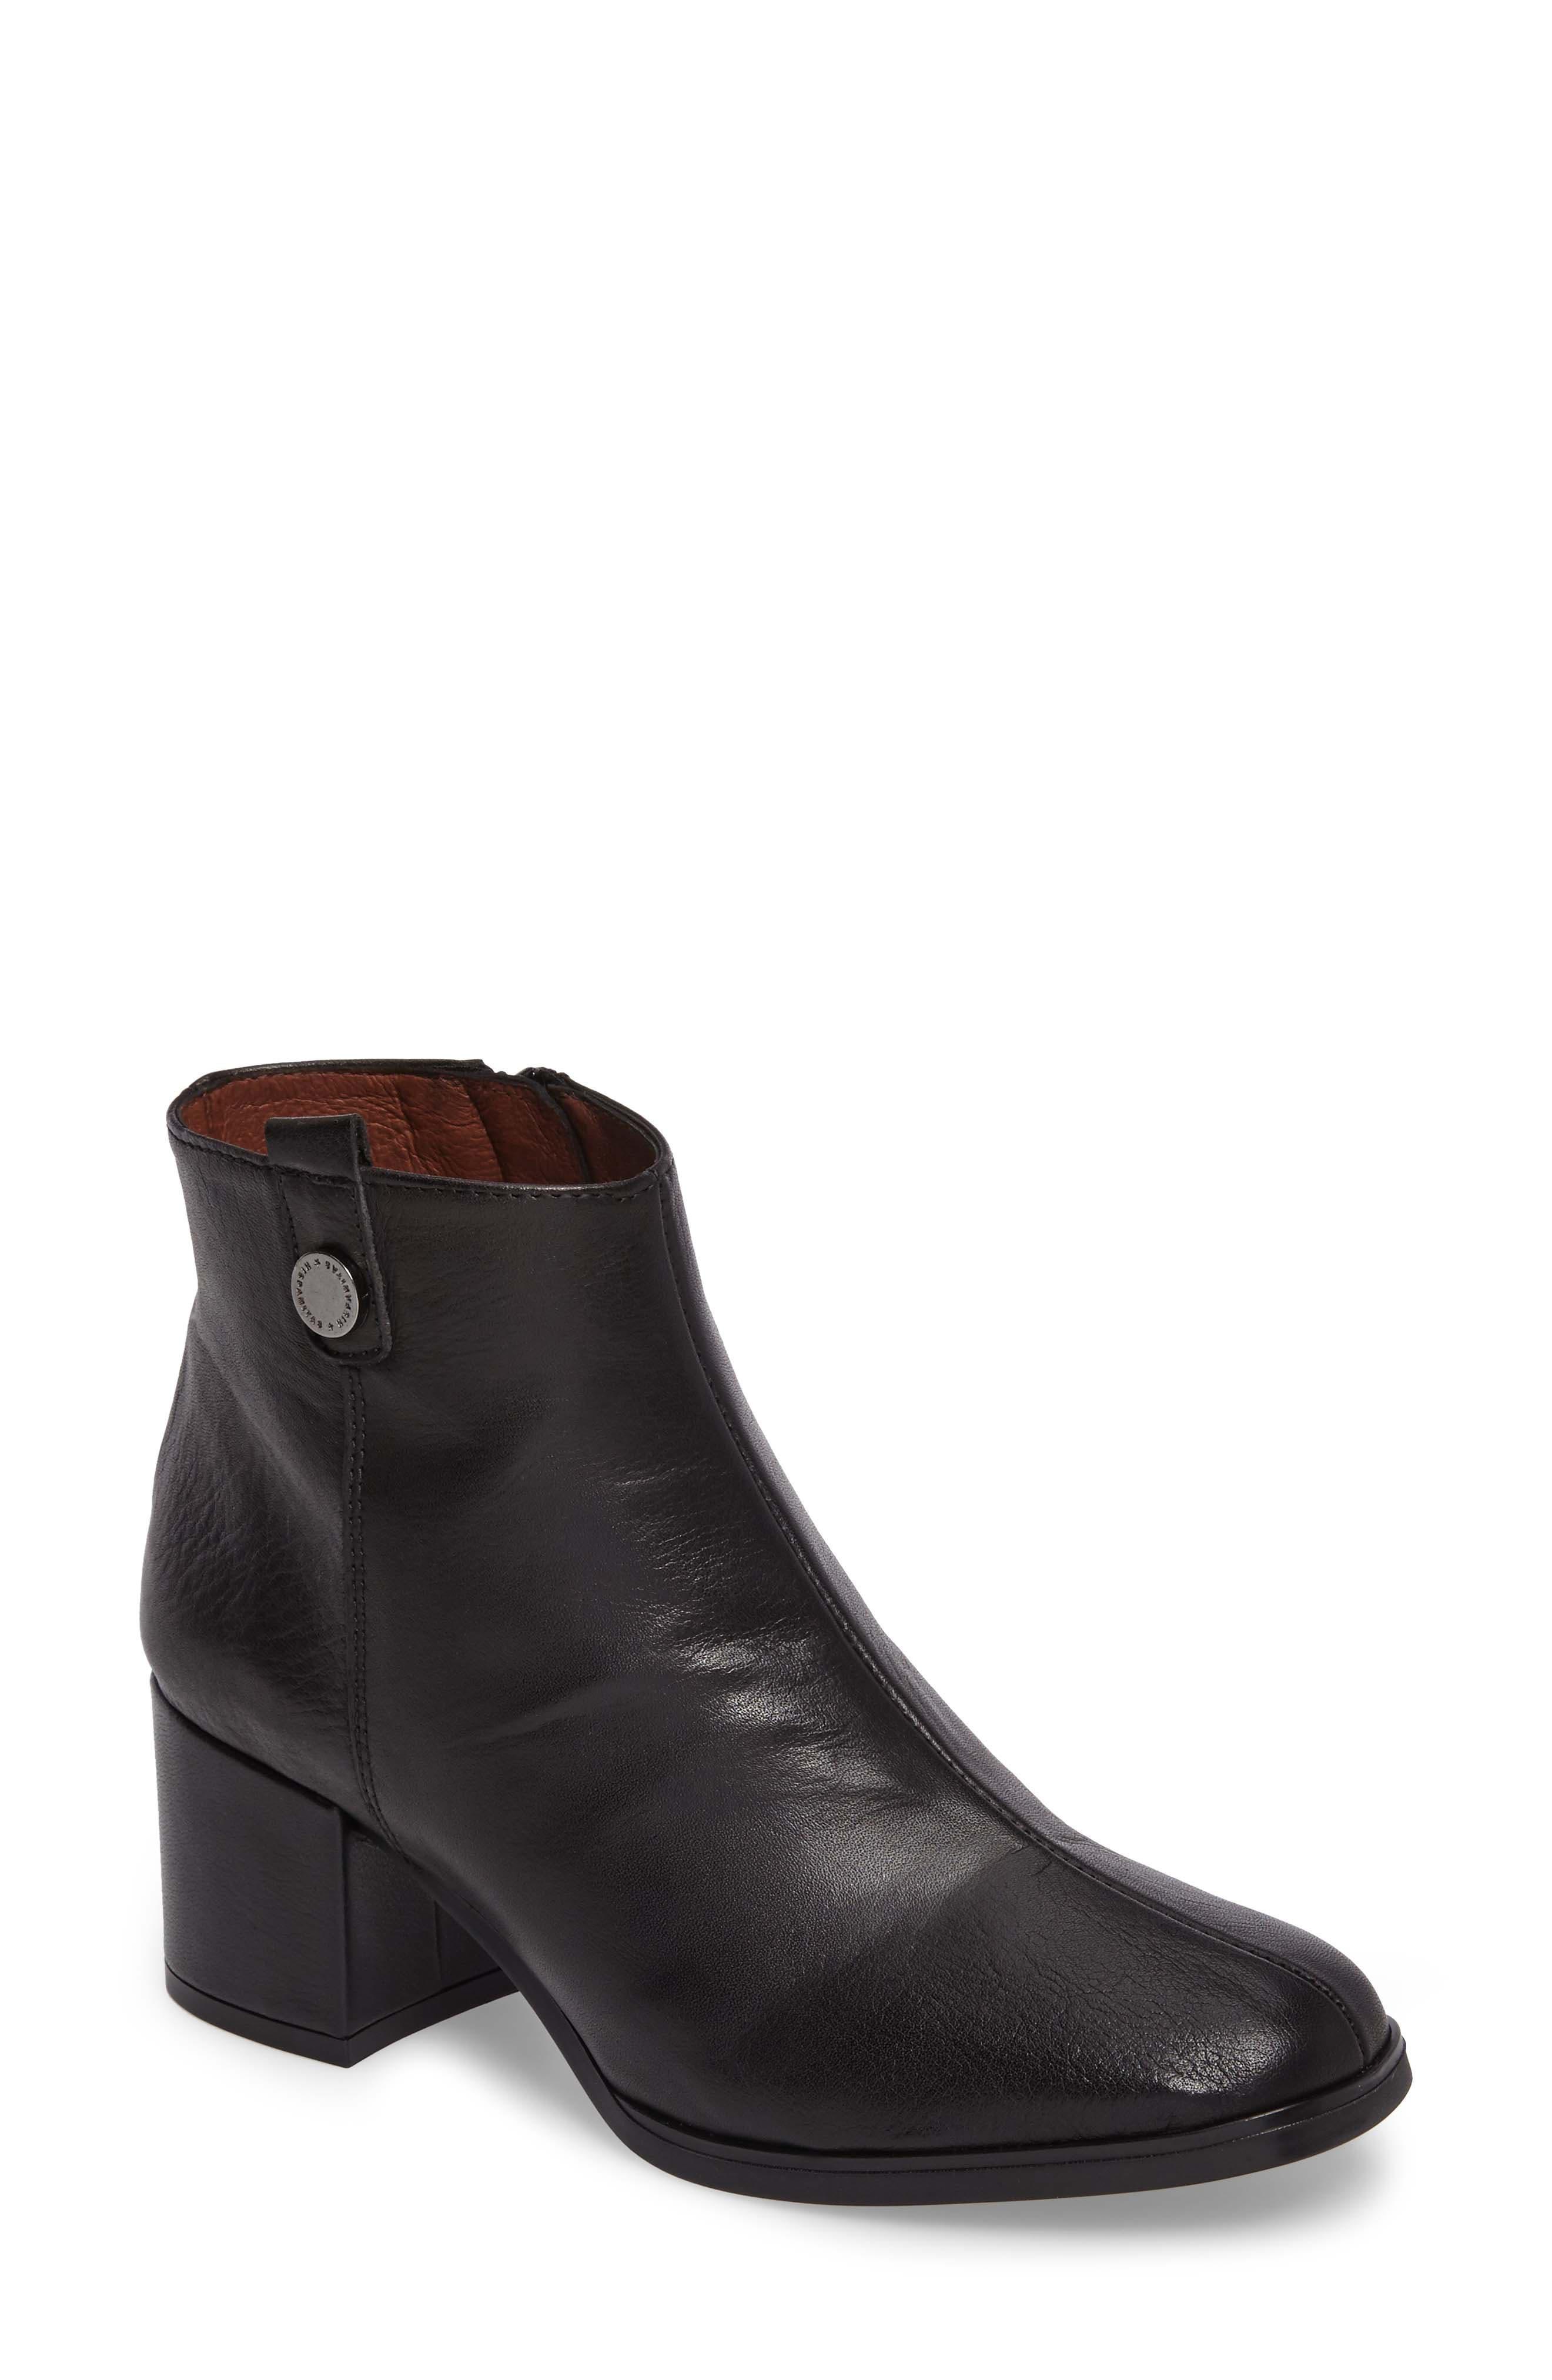 Christa Bootie,                         Main,                         color, Soho Black Leather